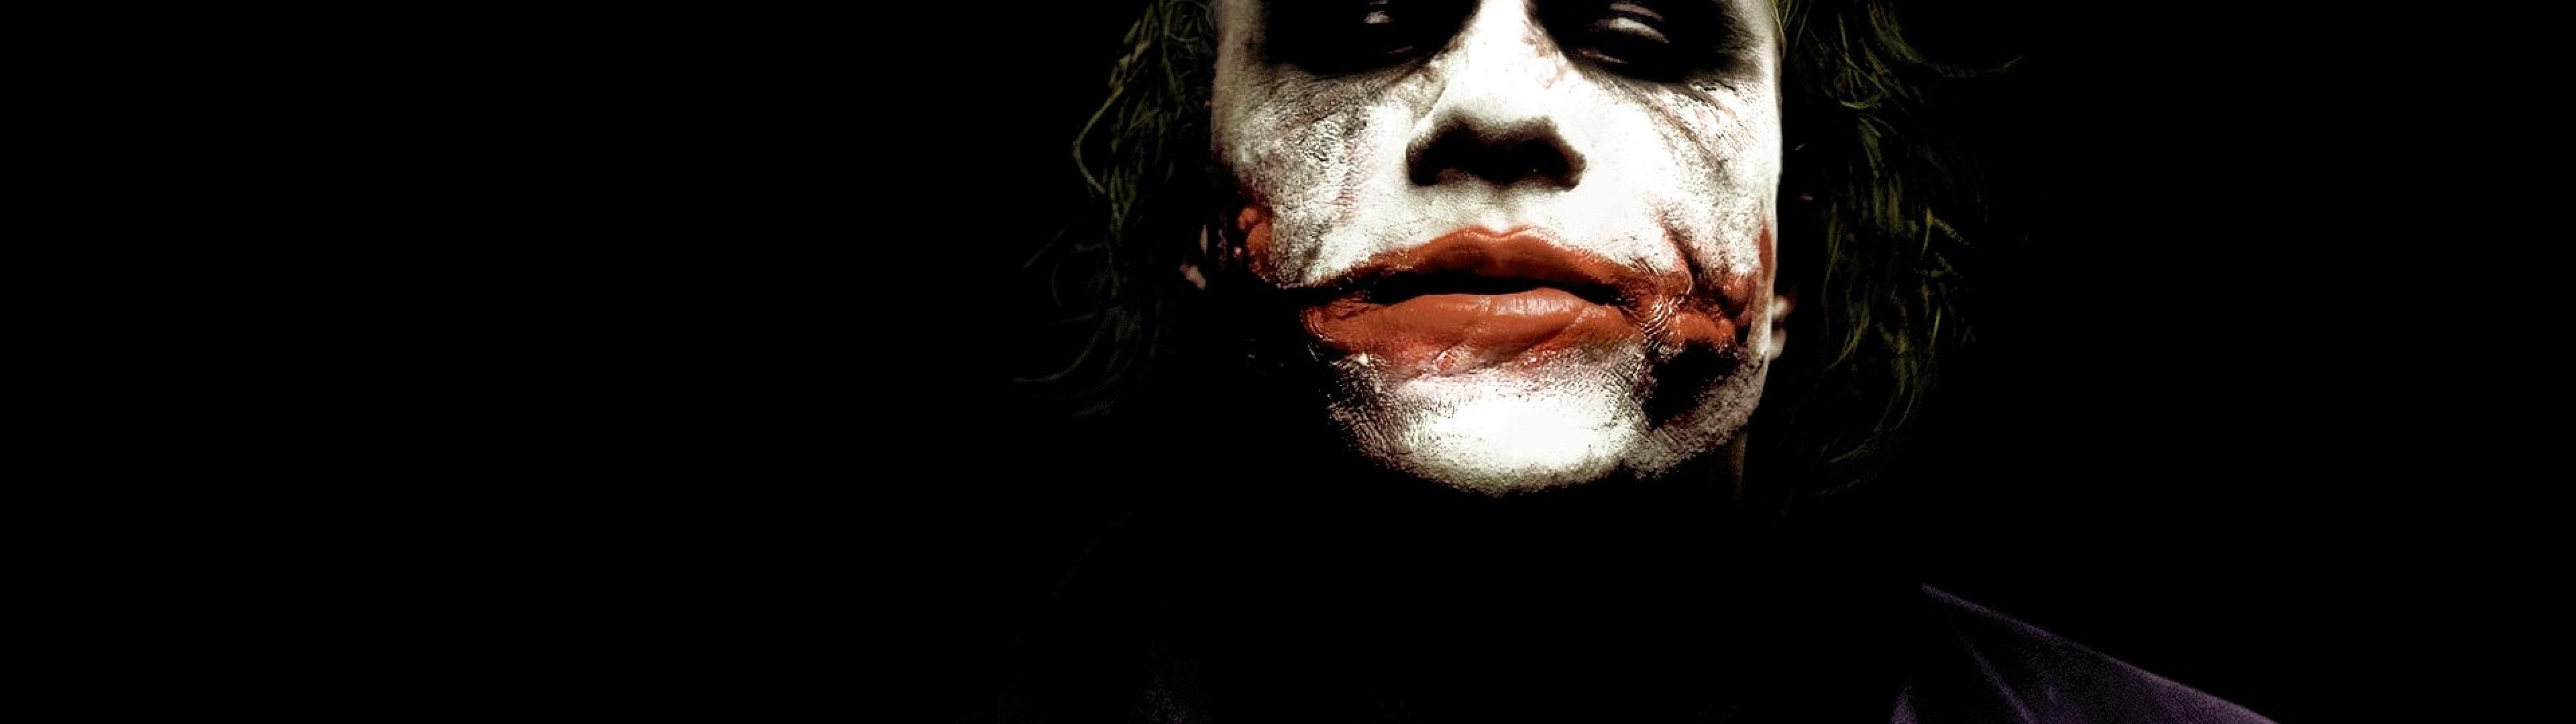 heath ledger the dark knight joker movies best aaEy 3840x1080